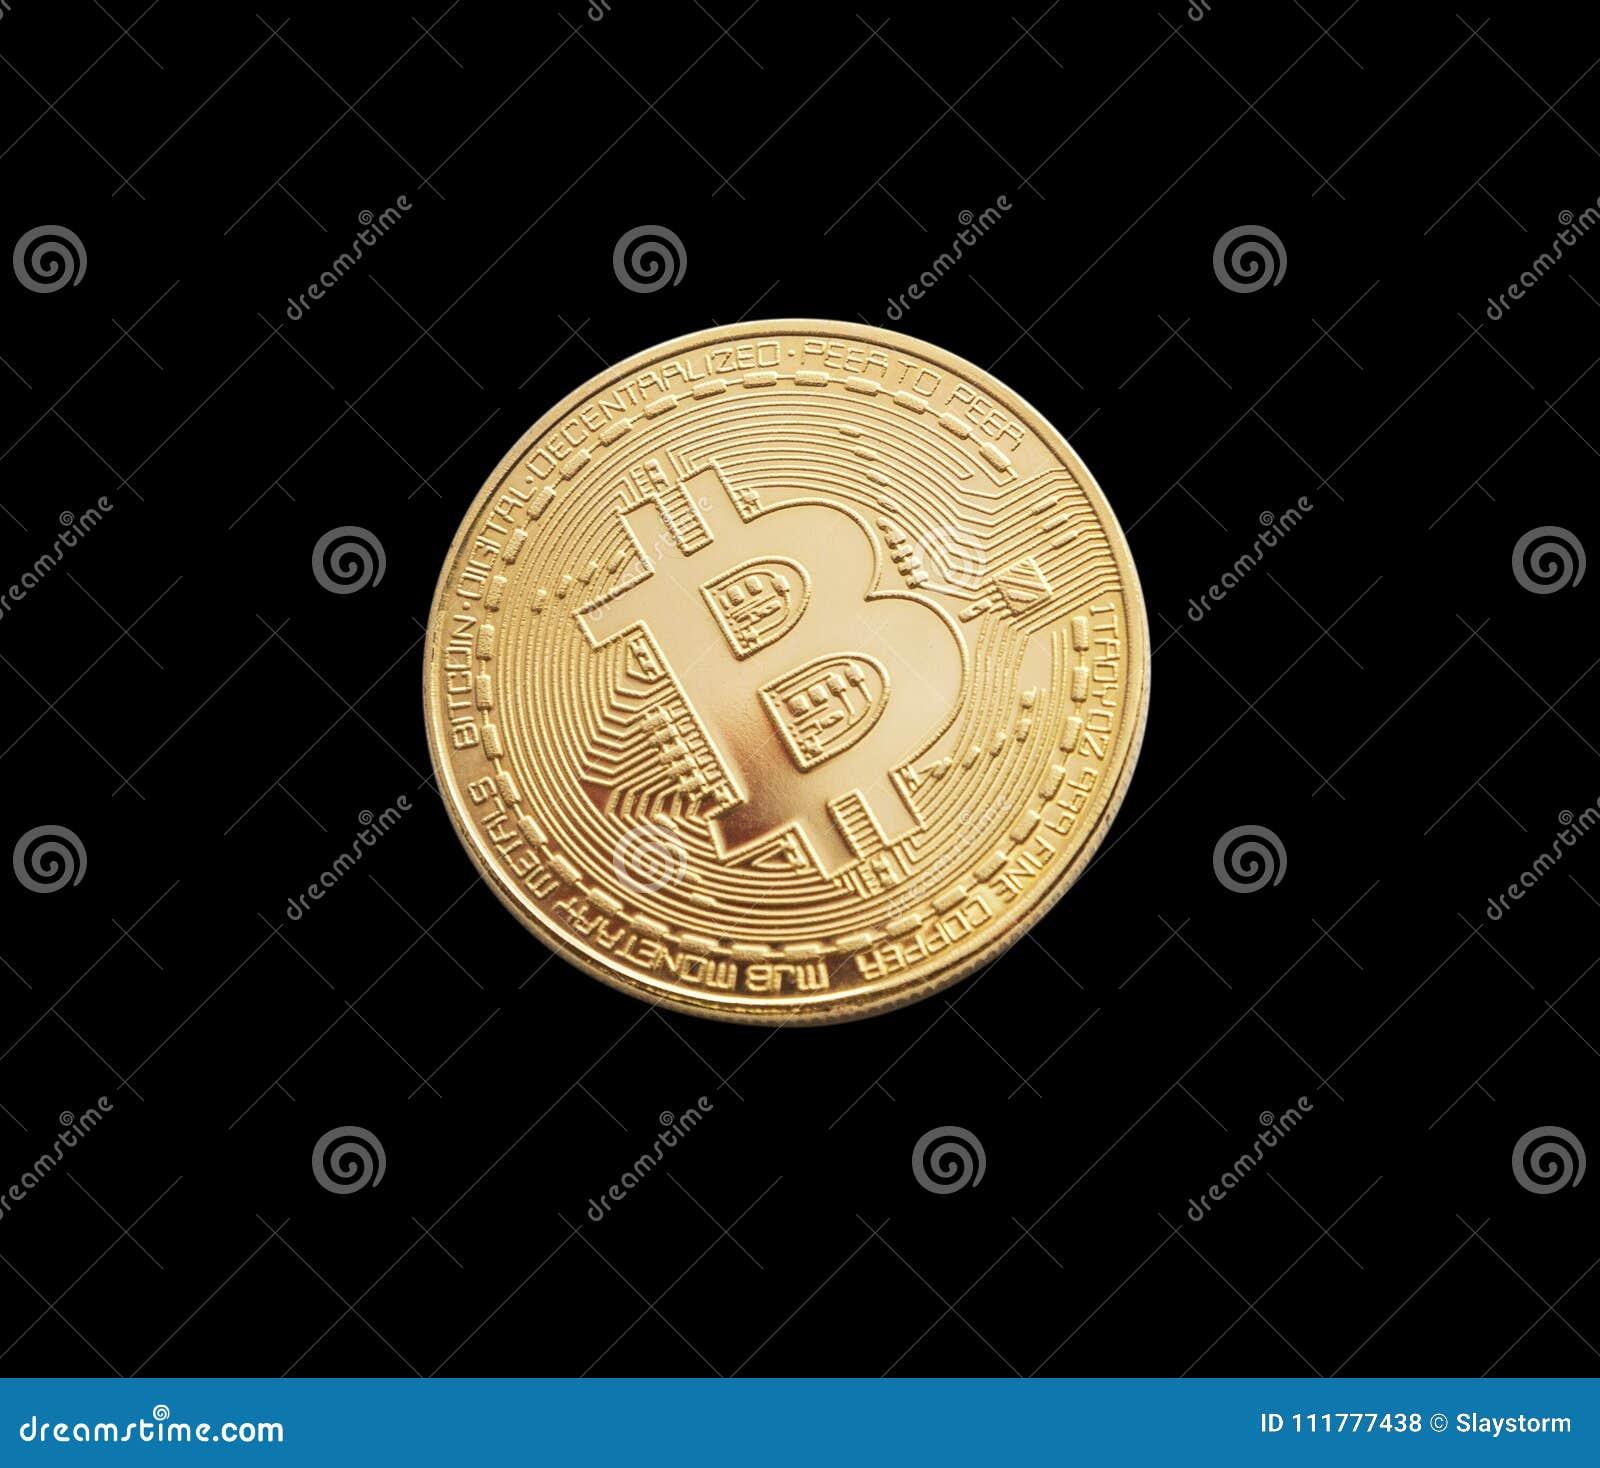 Bitcoin. Golden bitcoin isolated on black background